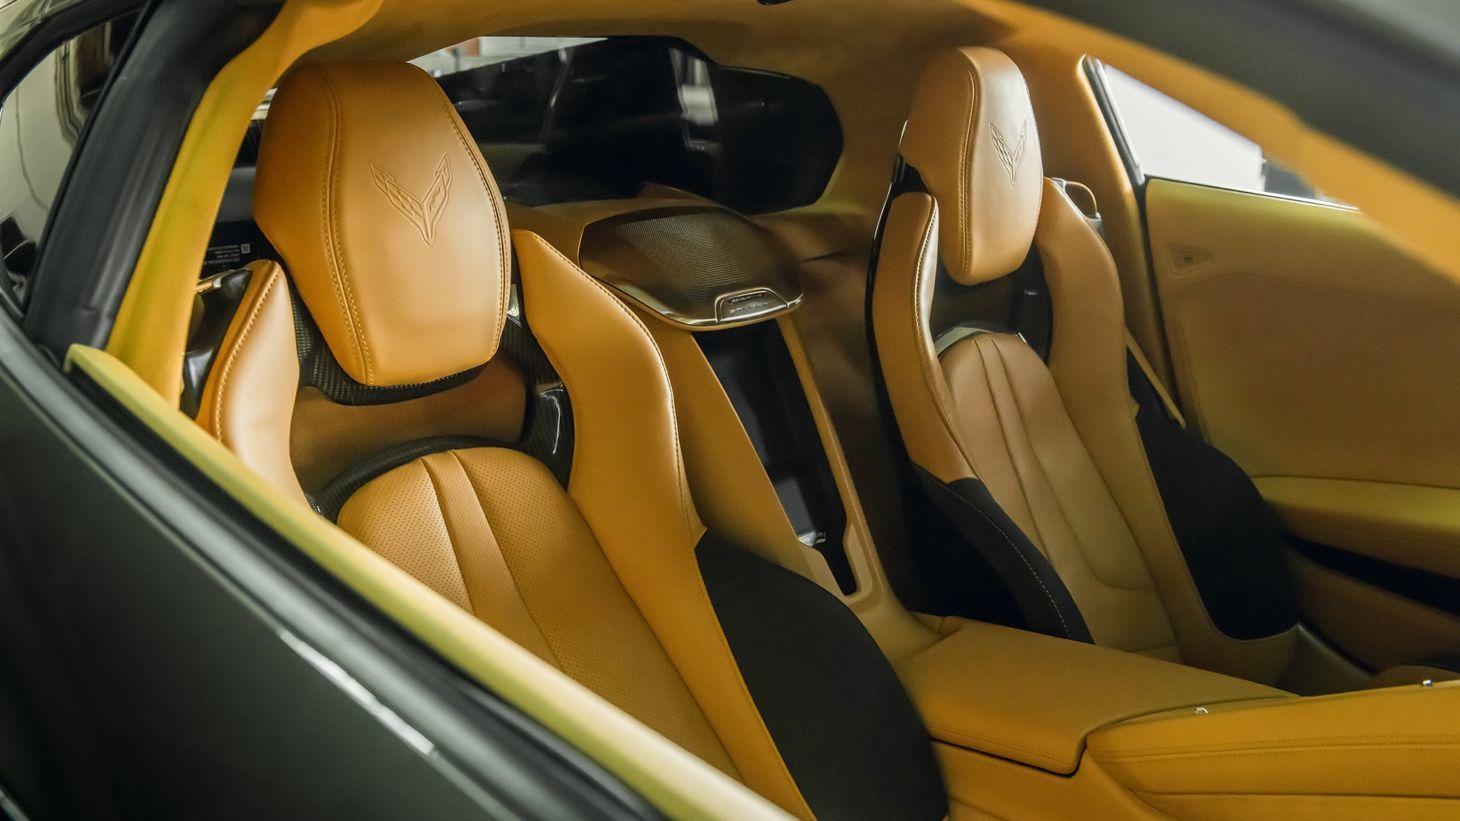 2020 chevrolet corvette yellow interior 1